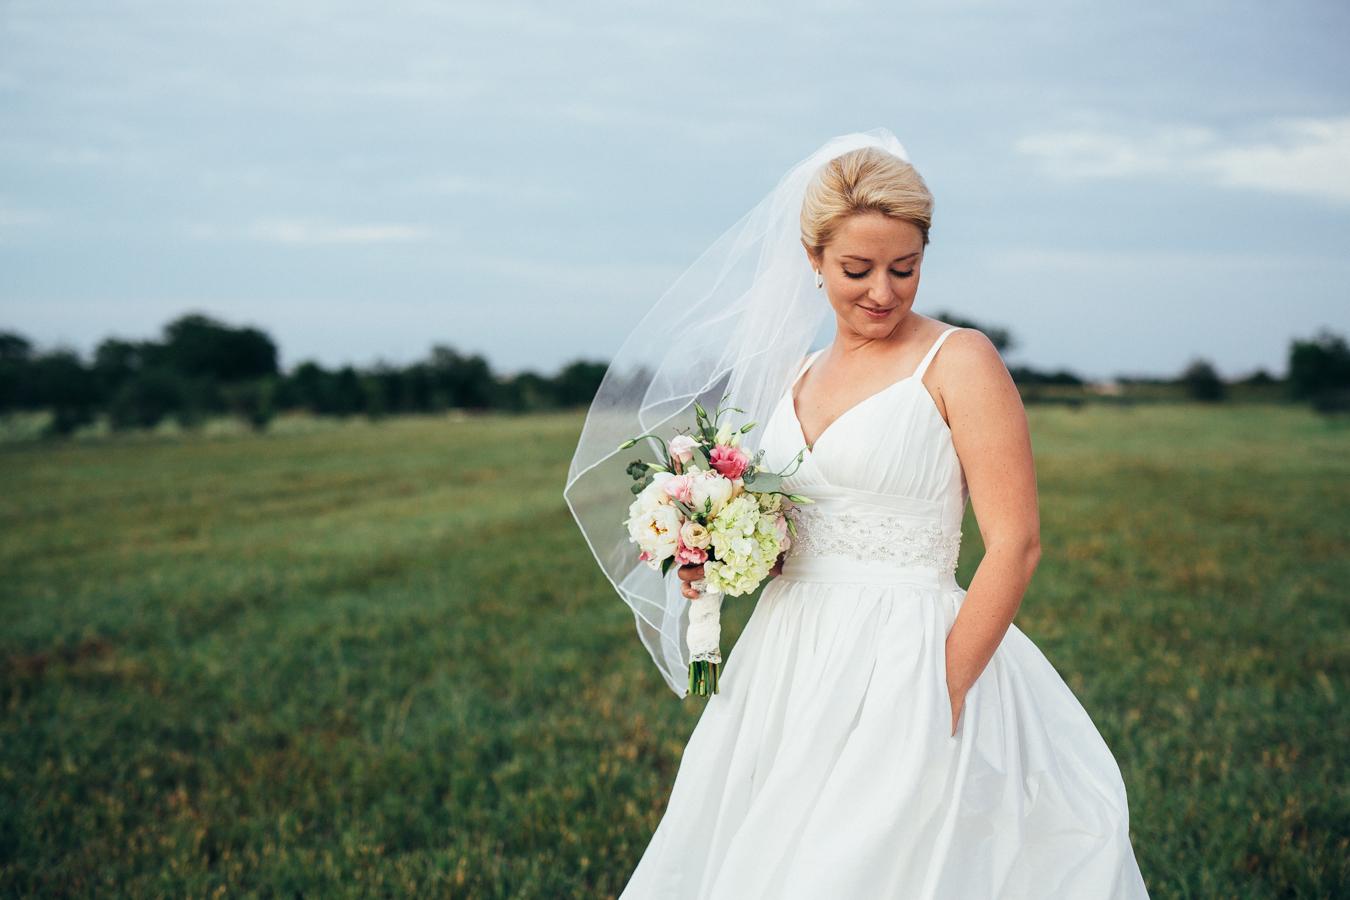 bridalportraits-cbarronjr-5397.jpg